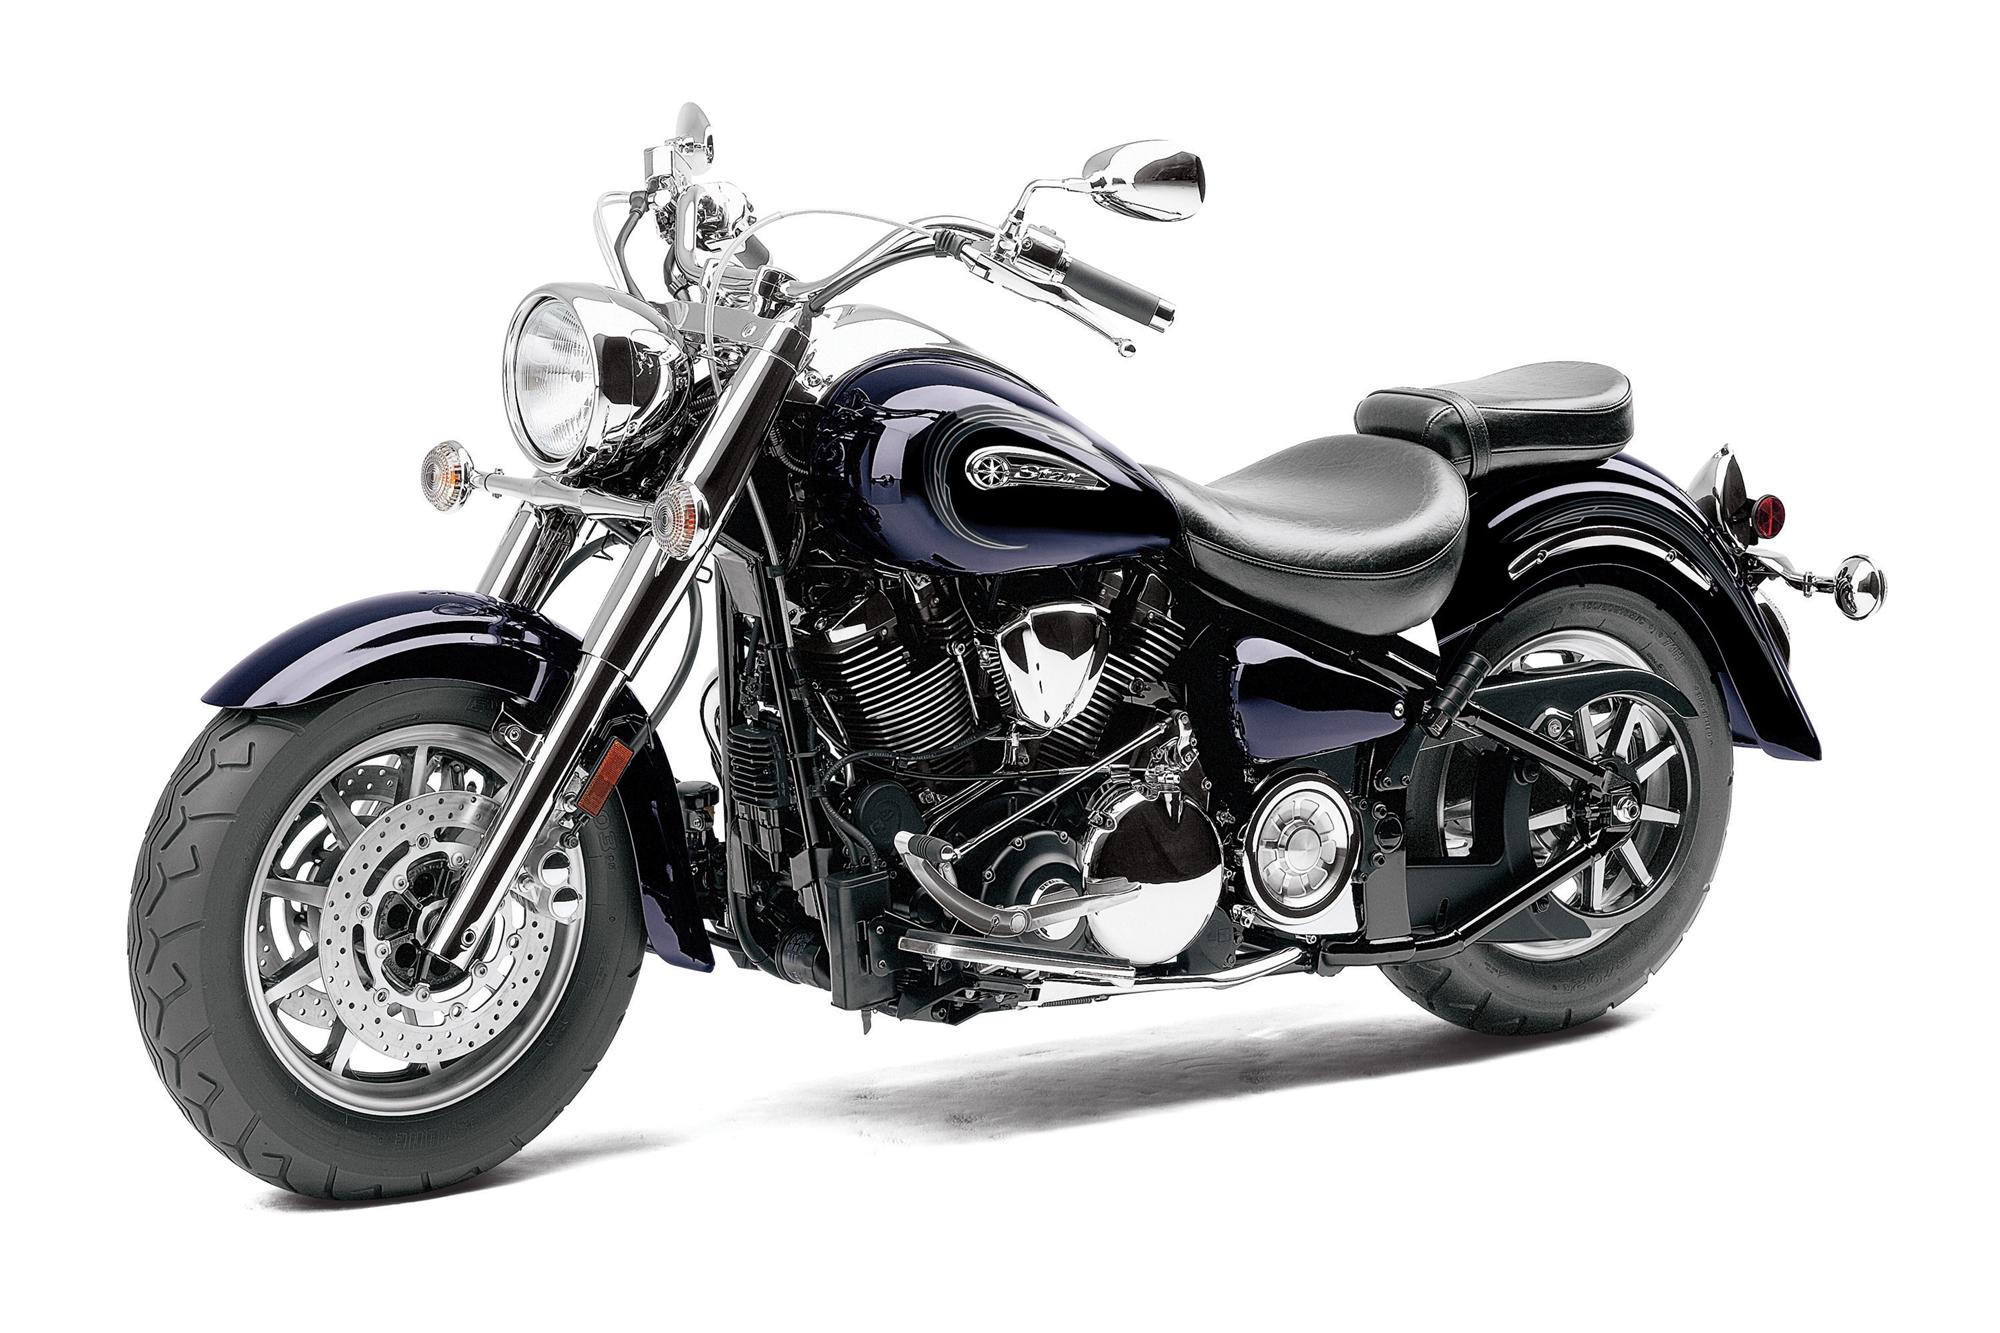 Search Results Motos Xt 225 Motos Yamaha 125 Cc 250 Cc ... - photo#13